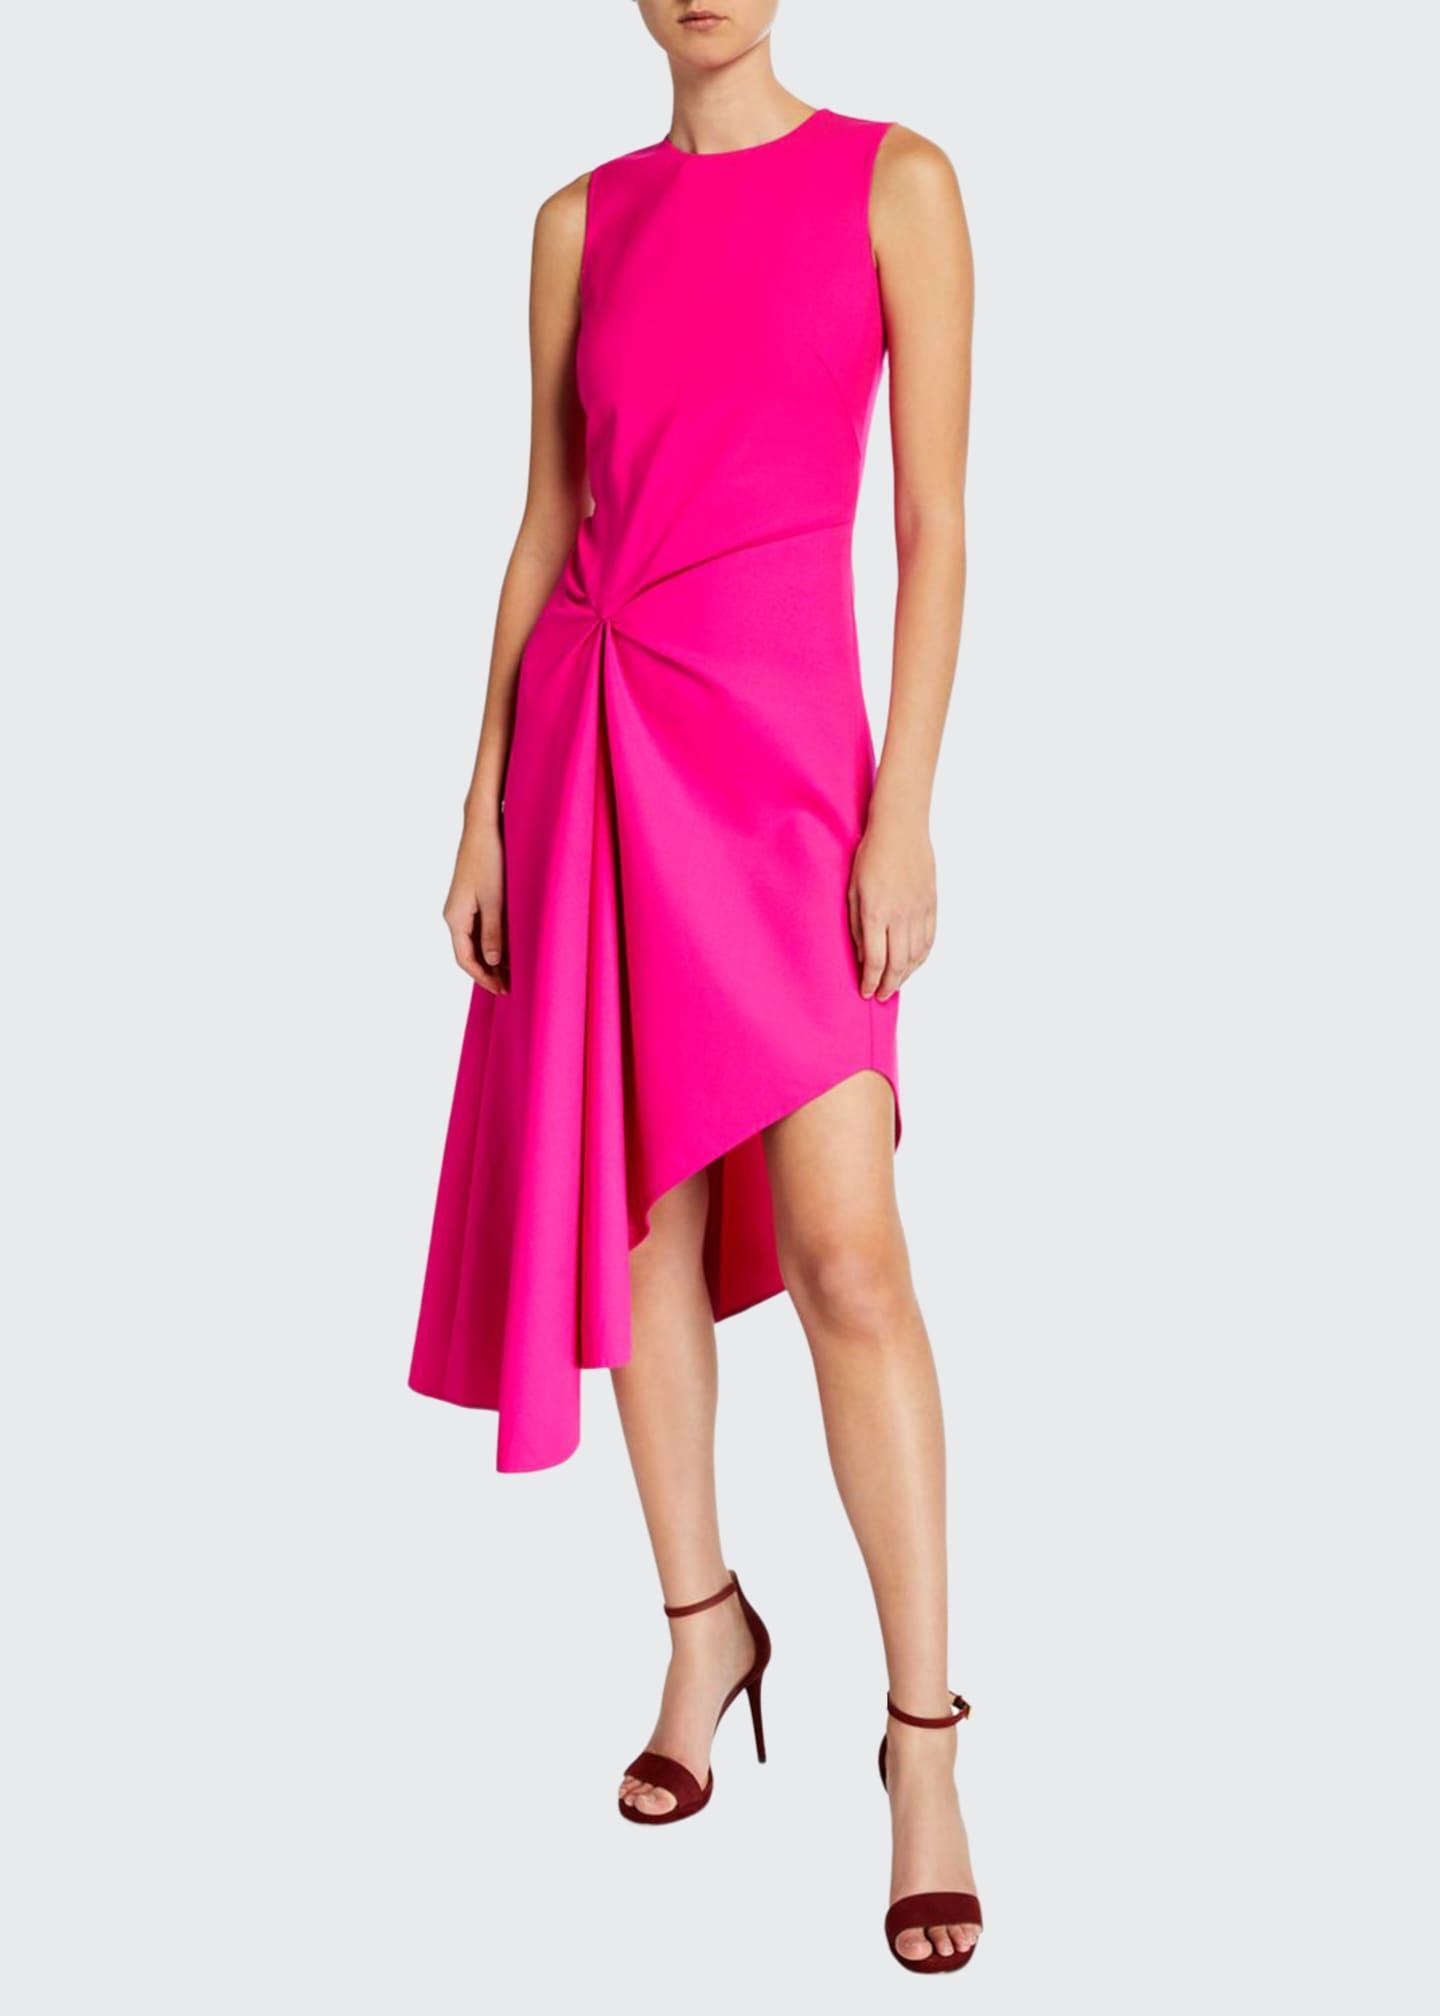 Oscar de la Renta Knotted Crepe Midi Dress